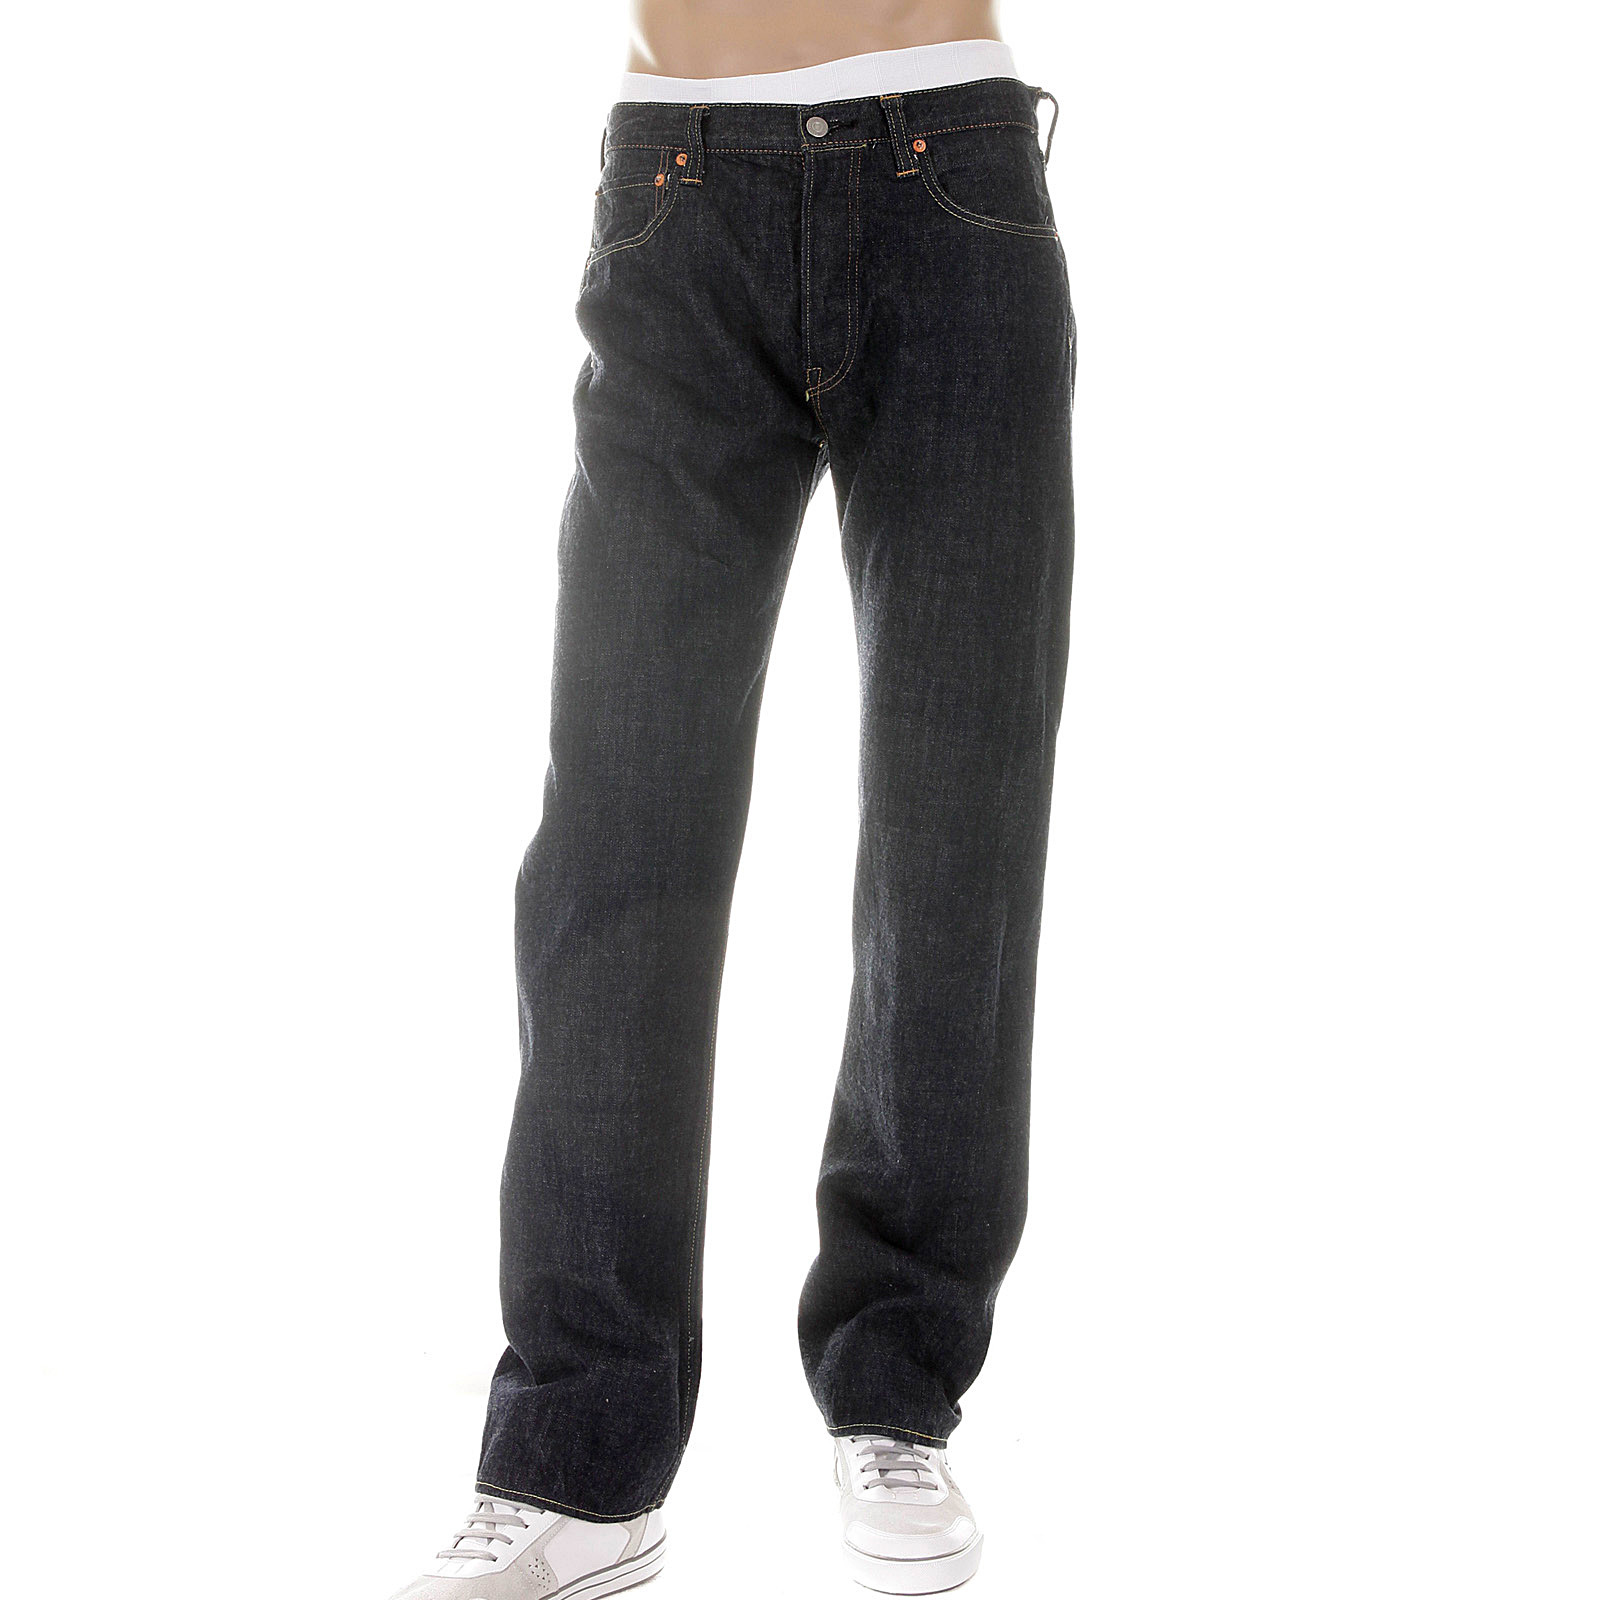 cool vintage selvedge denim jeans by sugar cane jeans